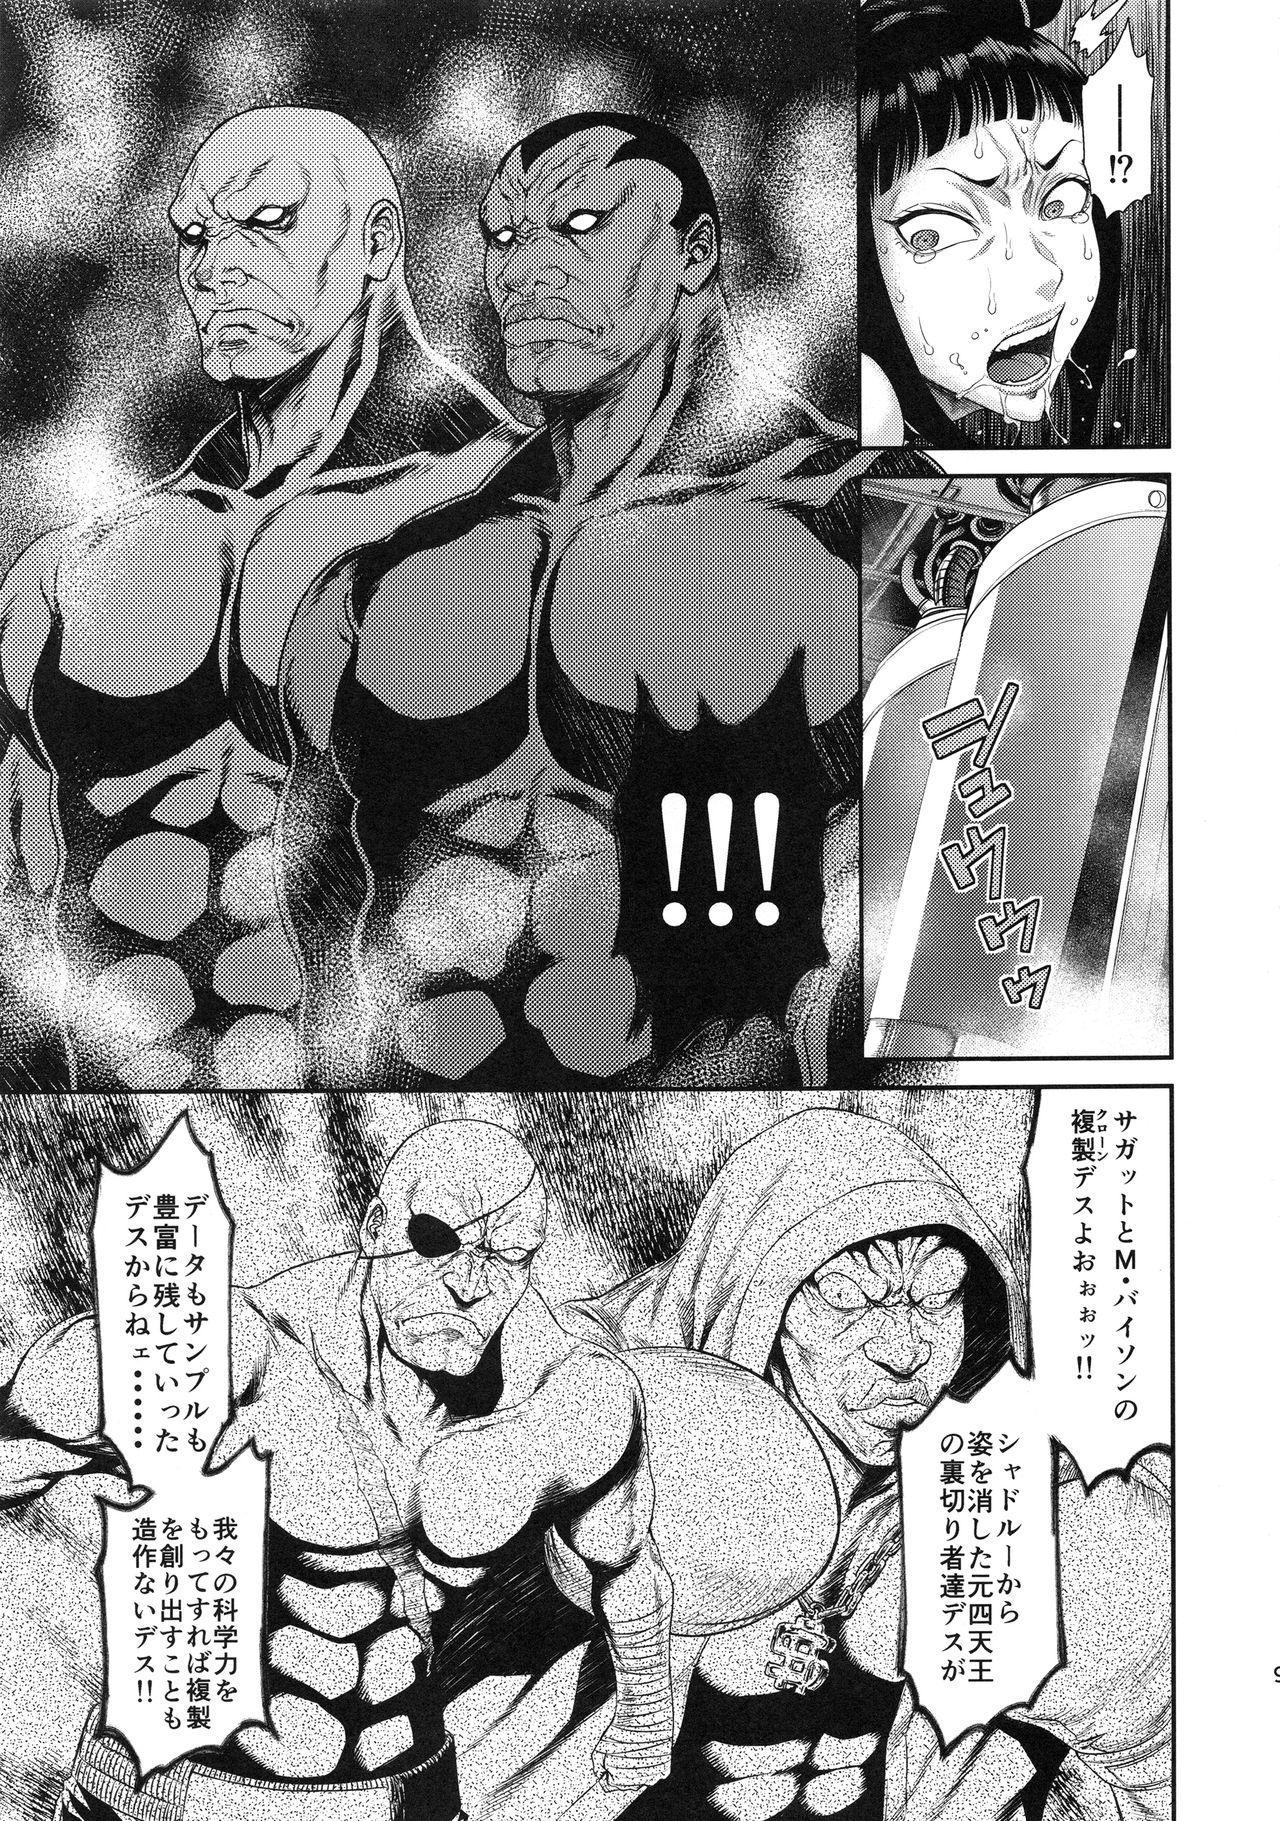 Jaaku - Wicked 7